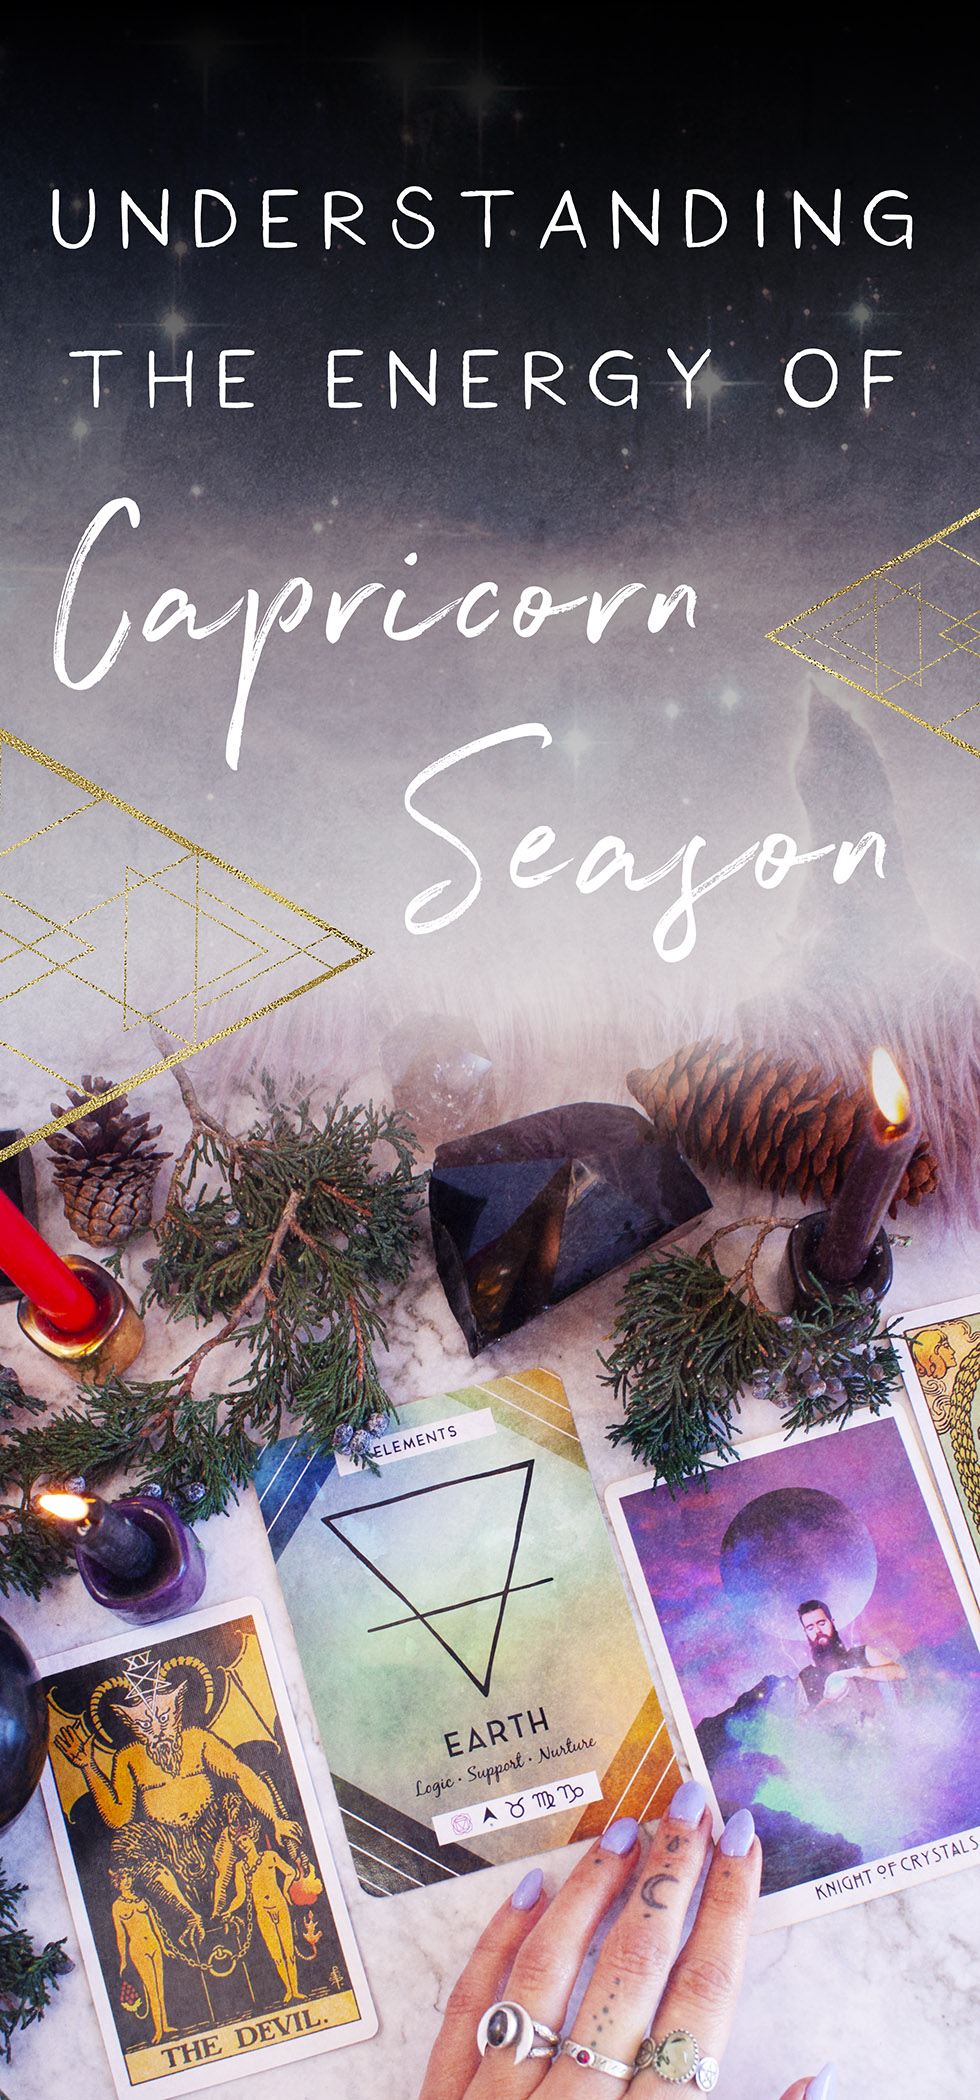 understanding the energy of capricorn season capricorn energy